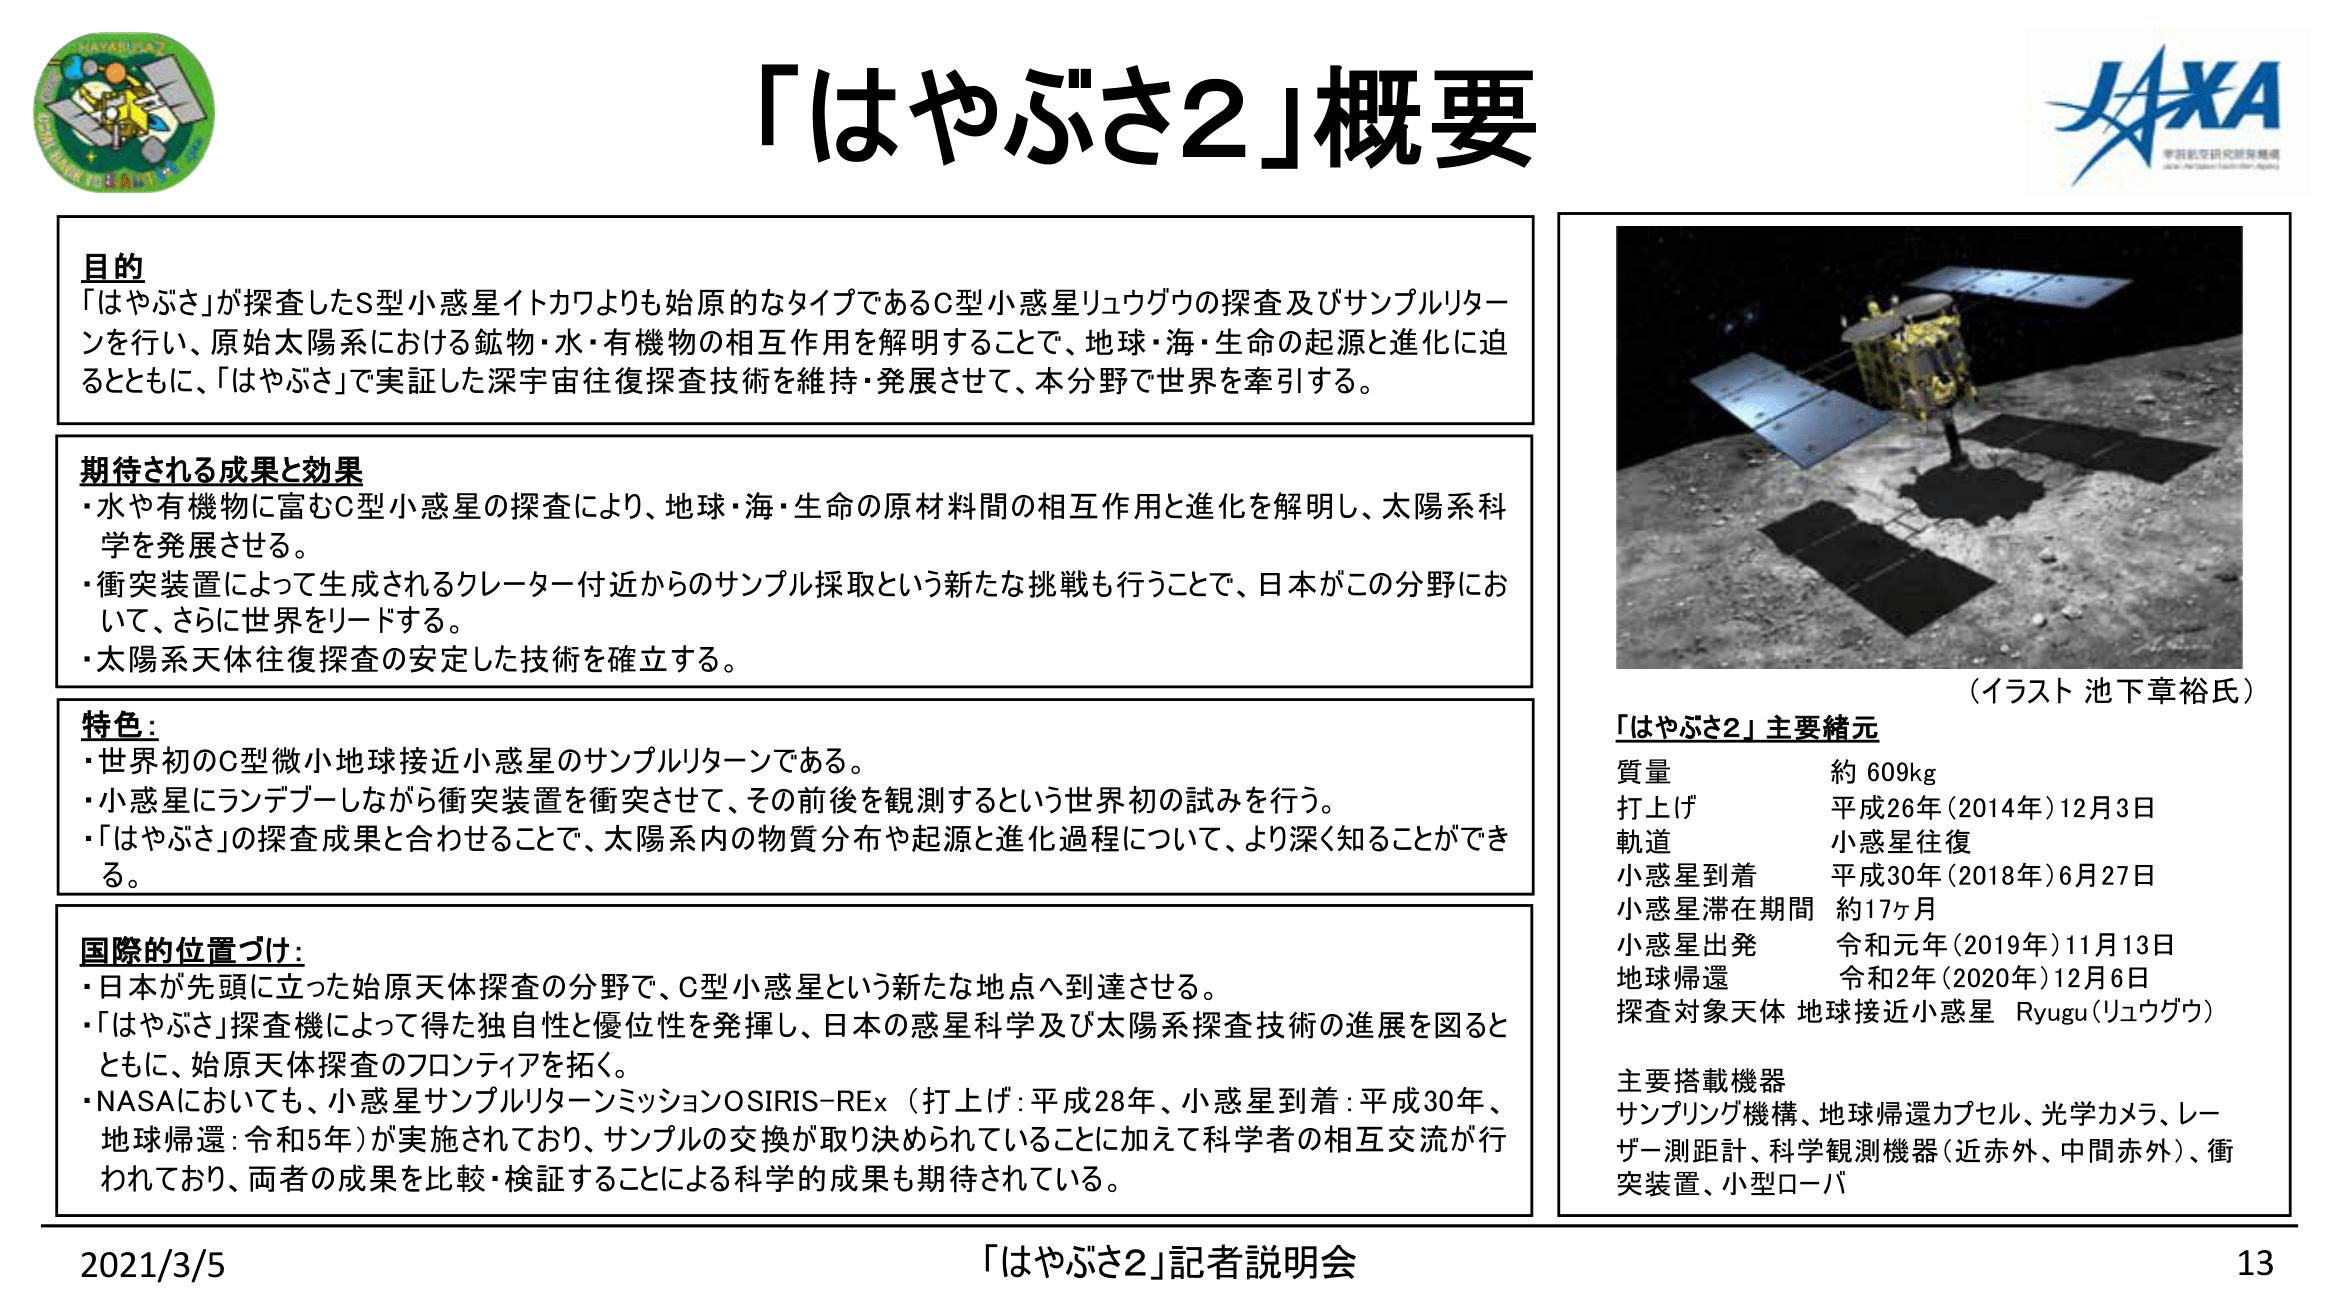 f:id:Imamura:20210305134219p:plain